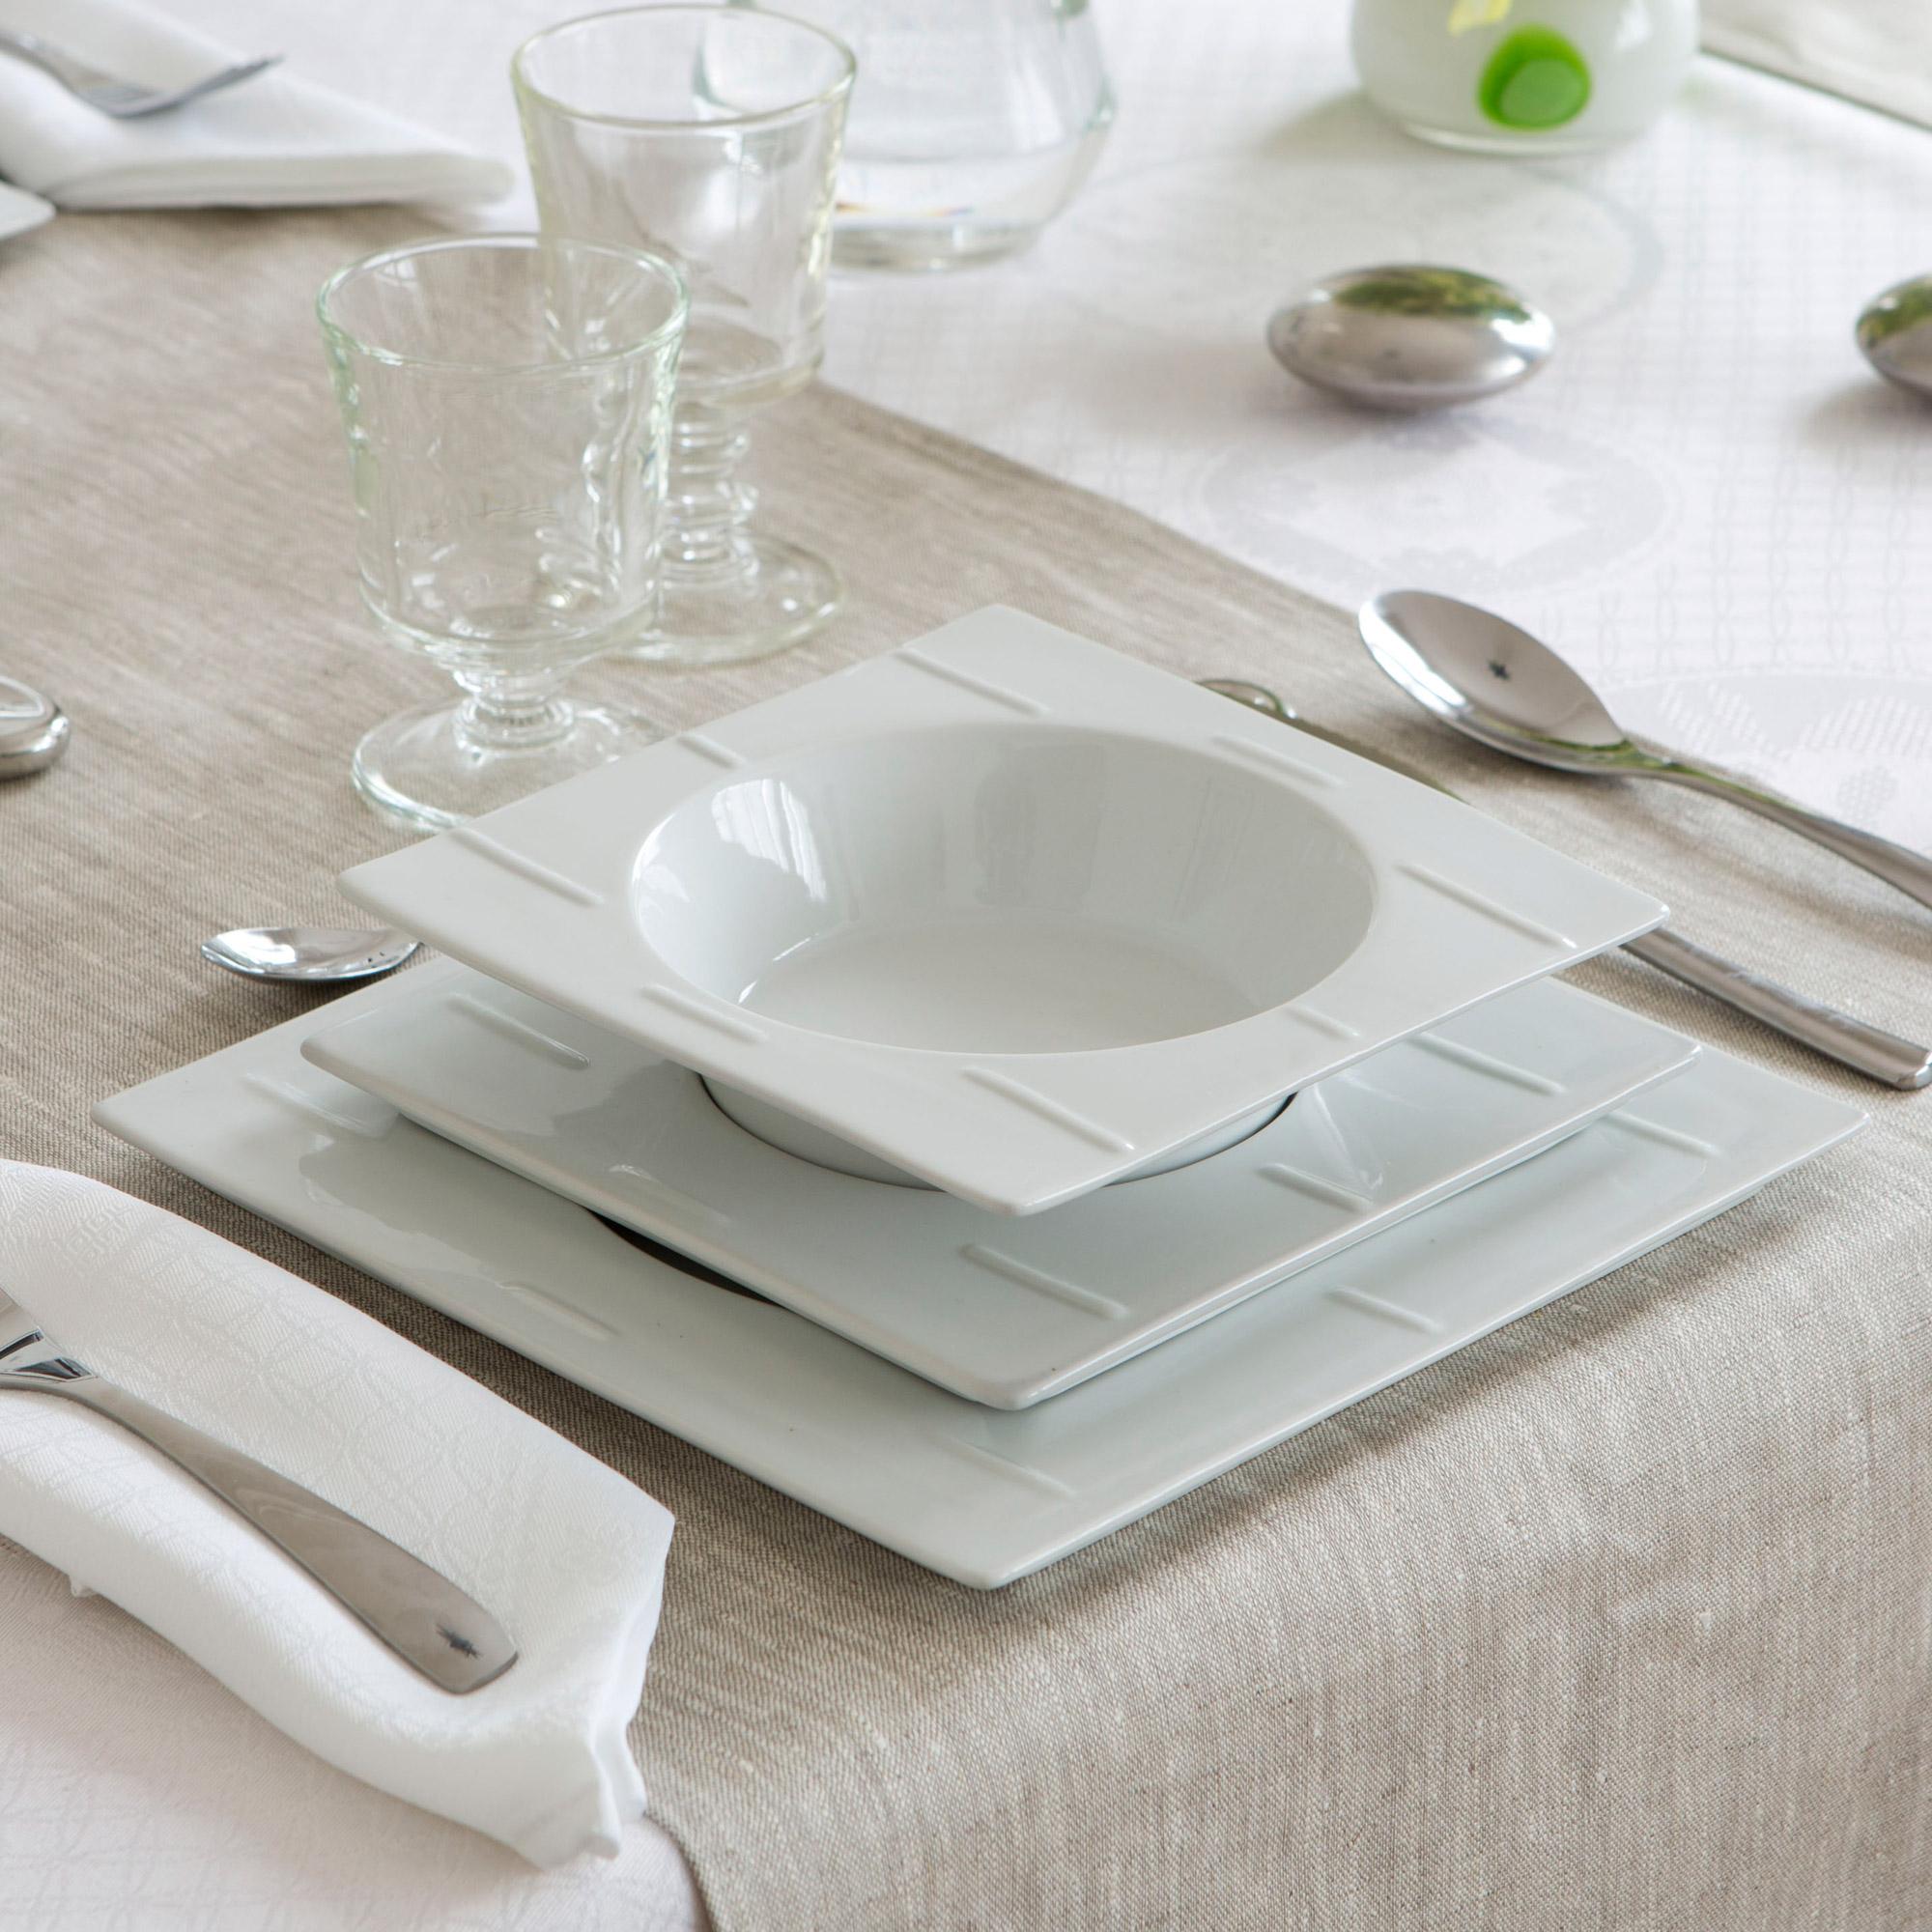 8f381180fa47f6 Service Vaisselle Design   Lave Vaisselle Design Acheter Vaisselle ...